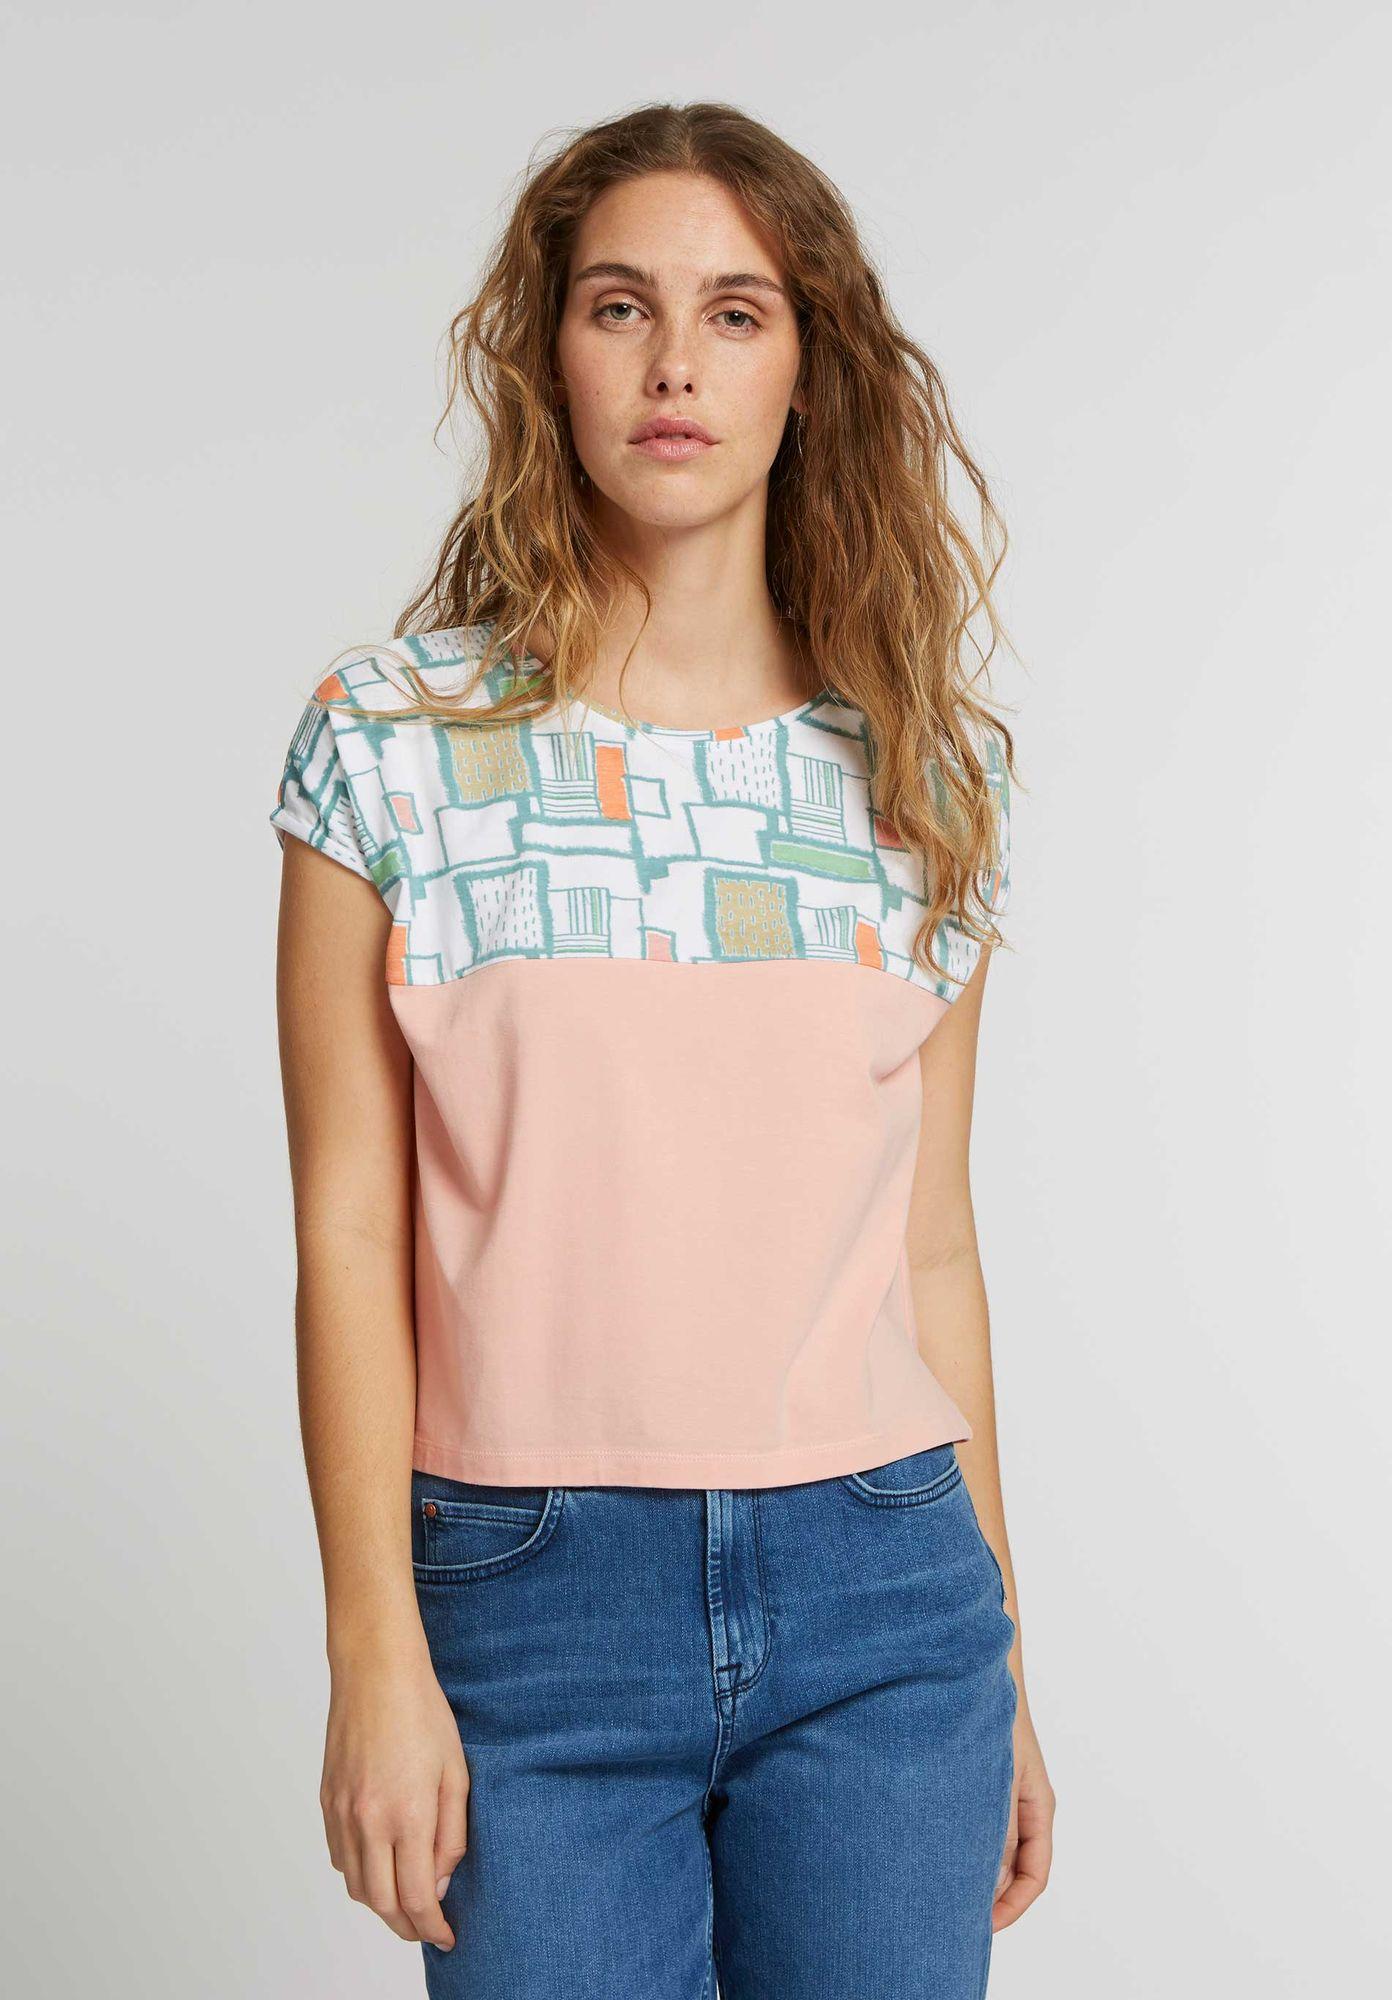 TT52 Square Shirt